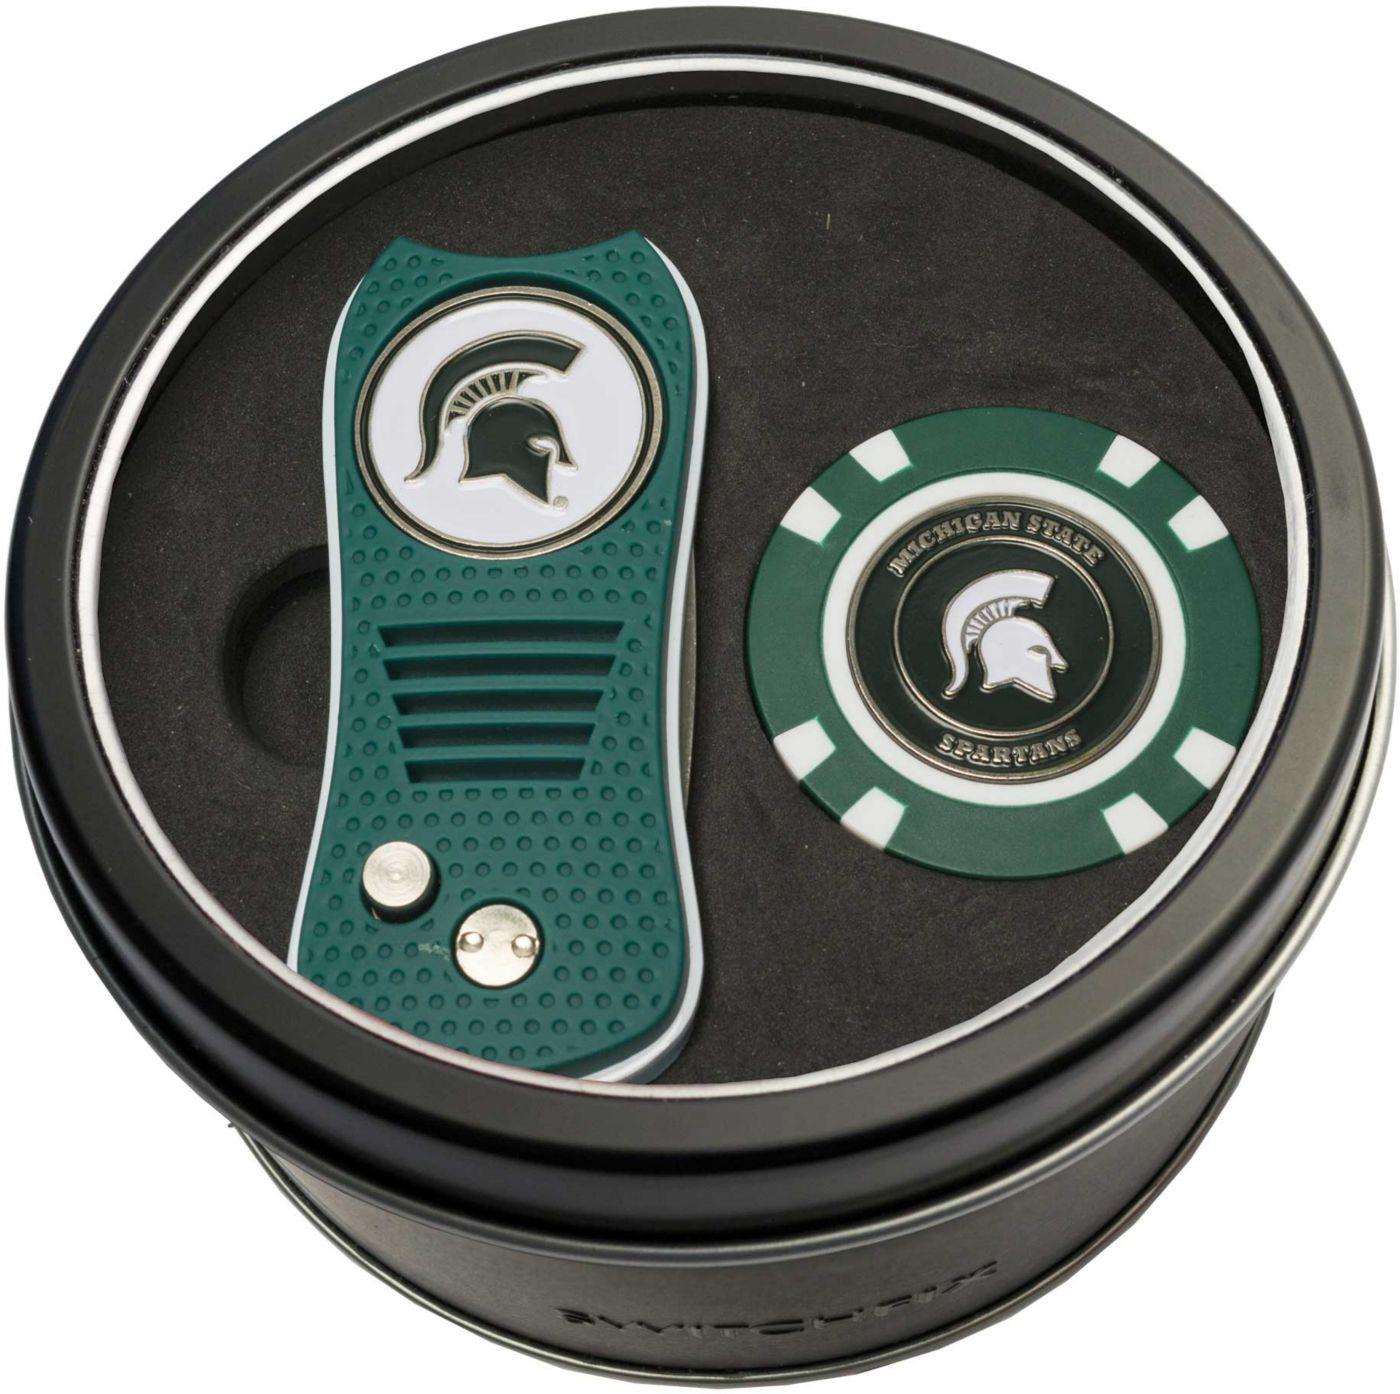 Team Golf Michigan State Spartans Switchfix Divot Tool and Poker Chip Ball Marker Set